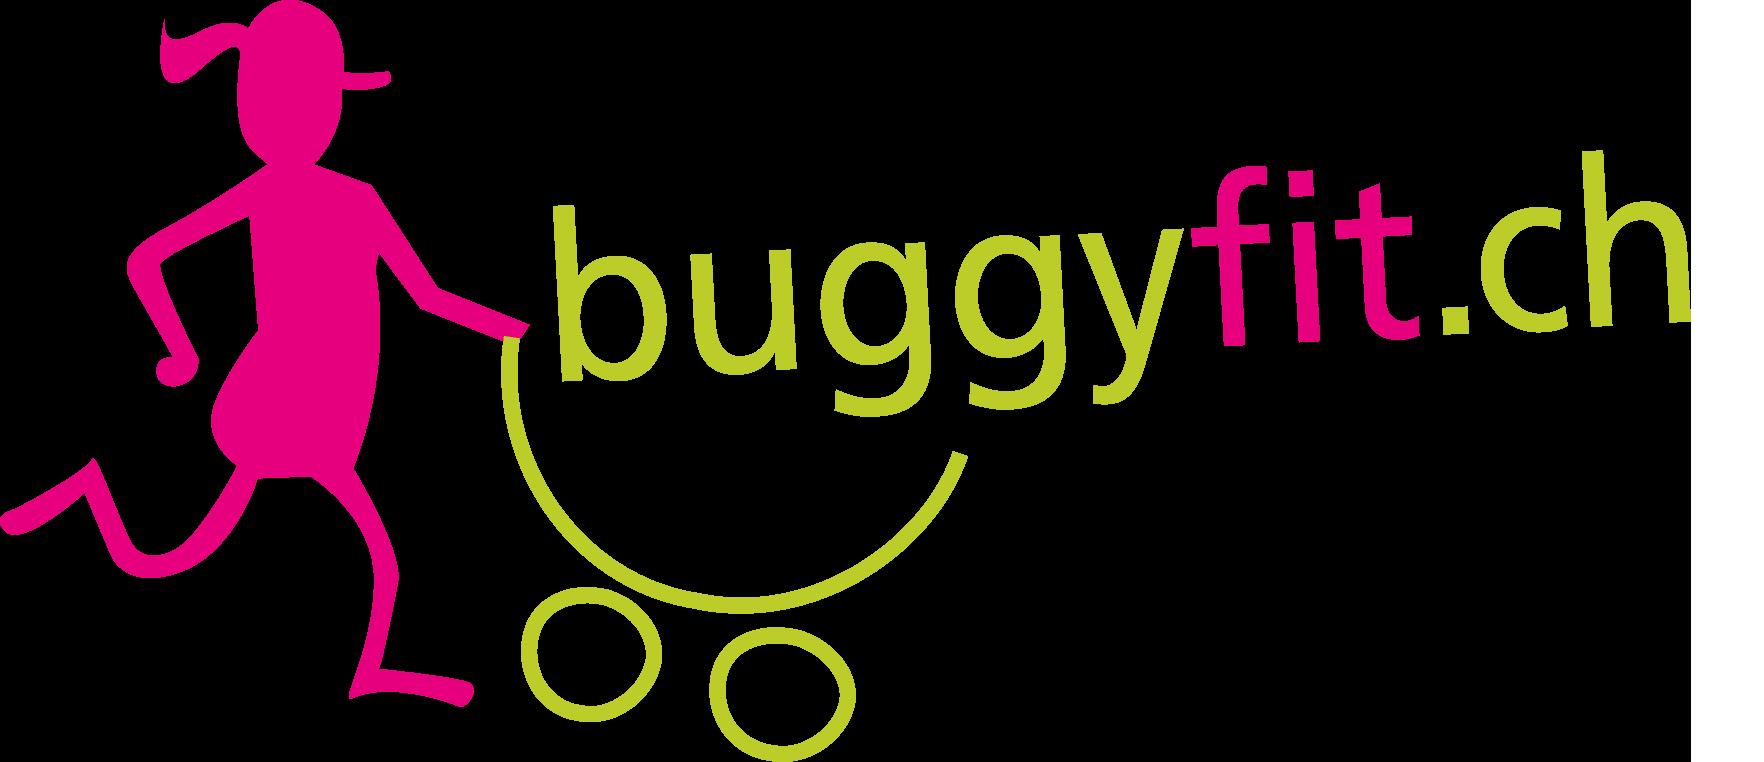 buggyfit - Sport nach der Schwangerschaft